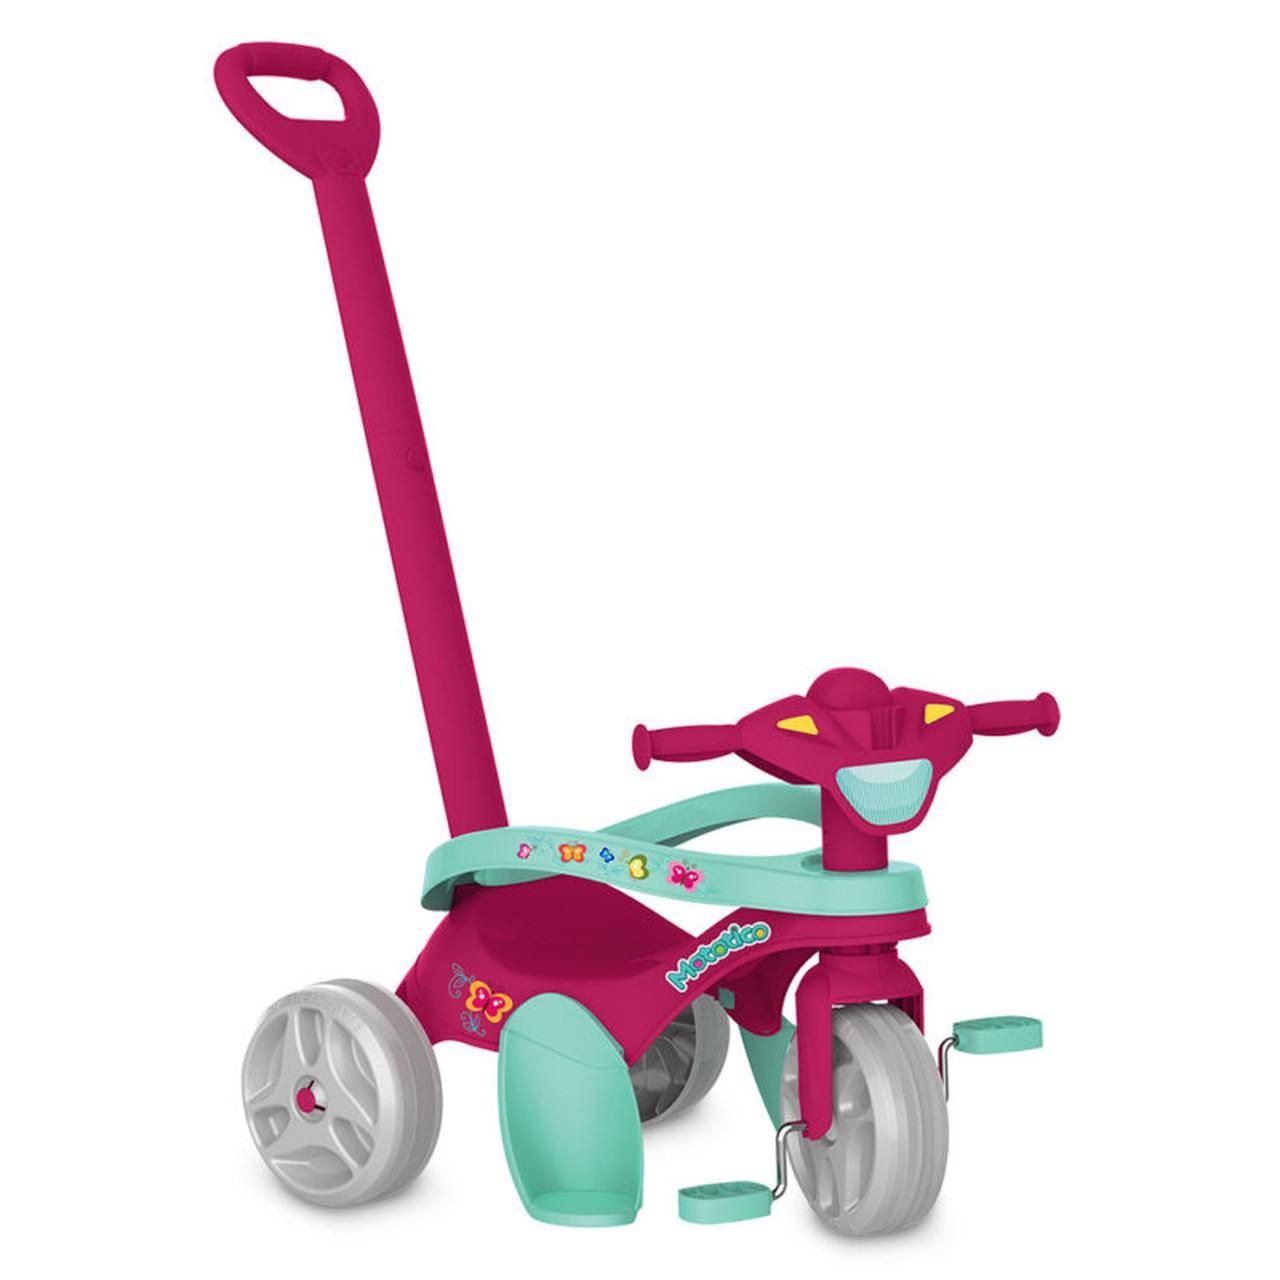 Triciclo Infantil Mototico Passeio E Pedal Rosa Bandeirante 693